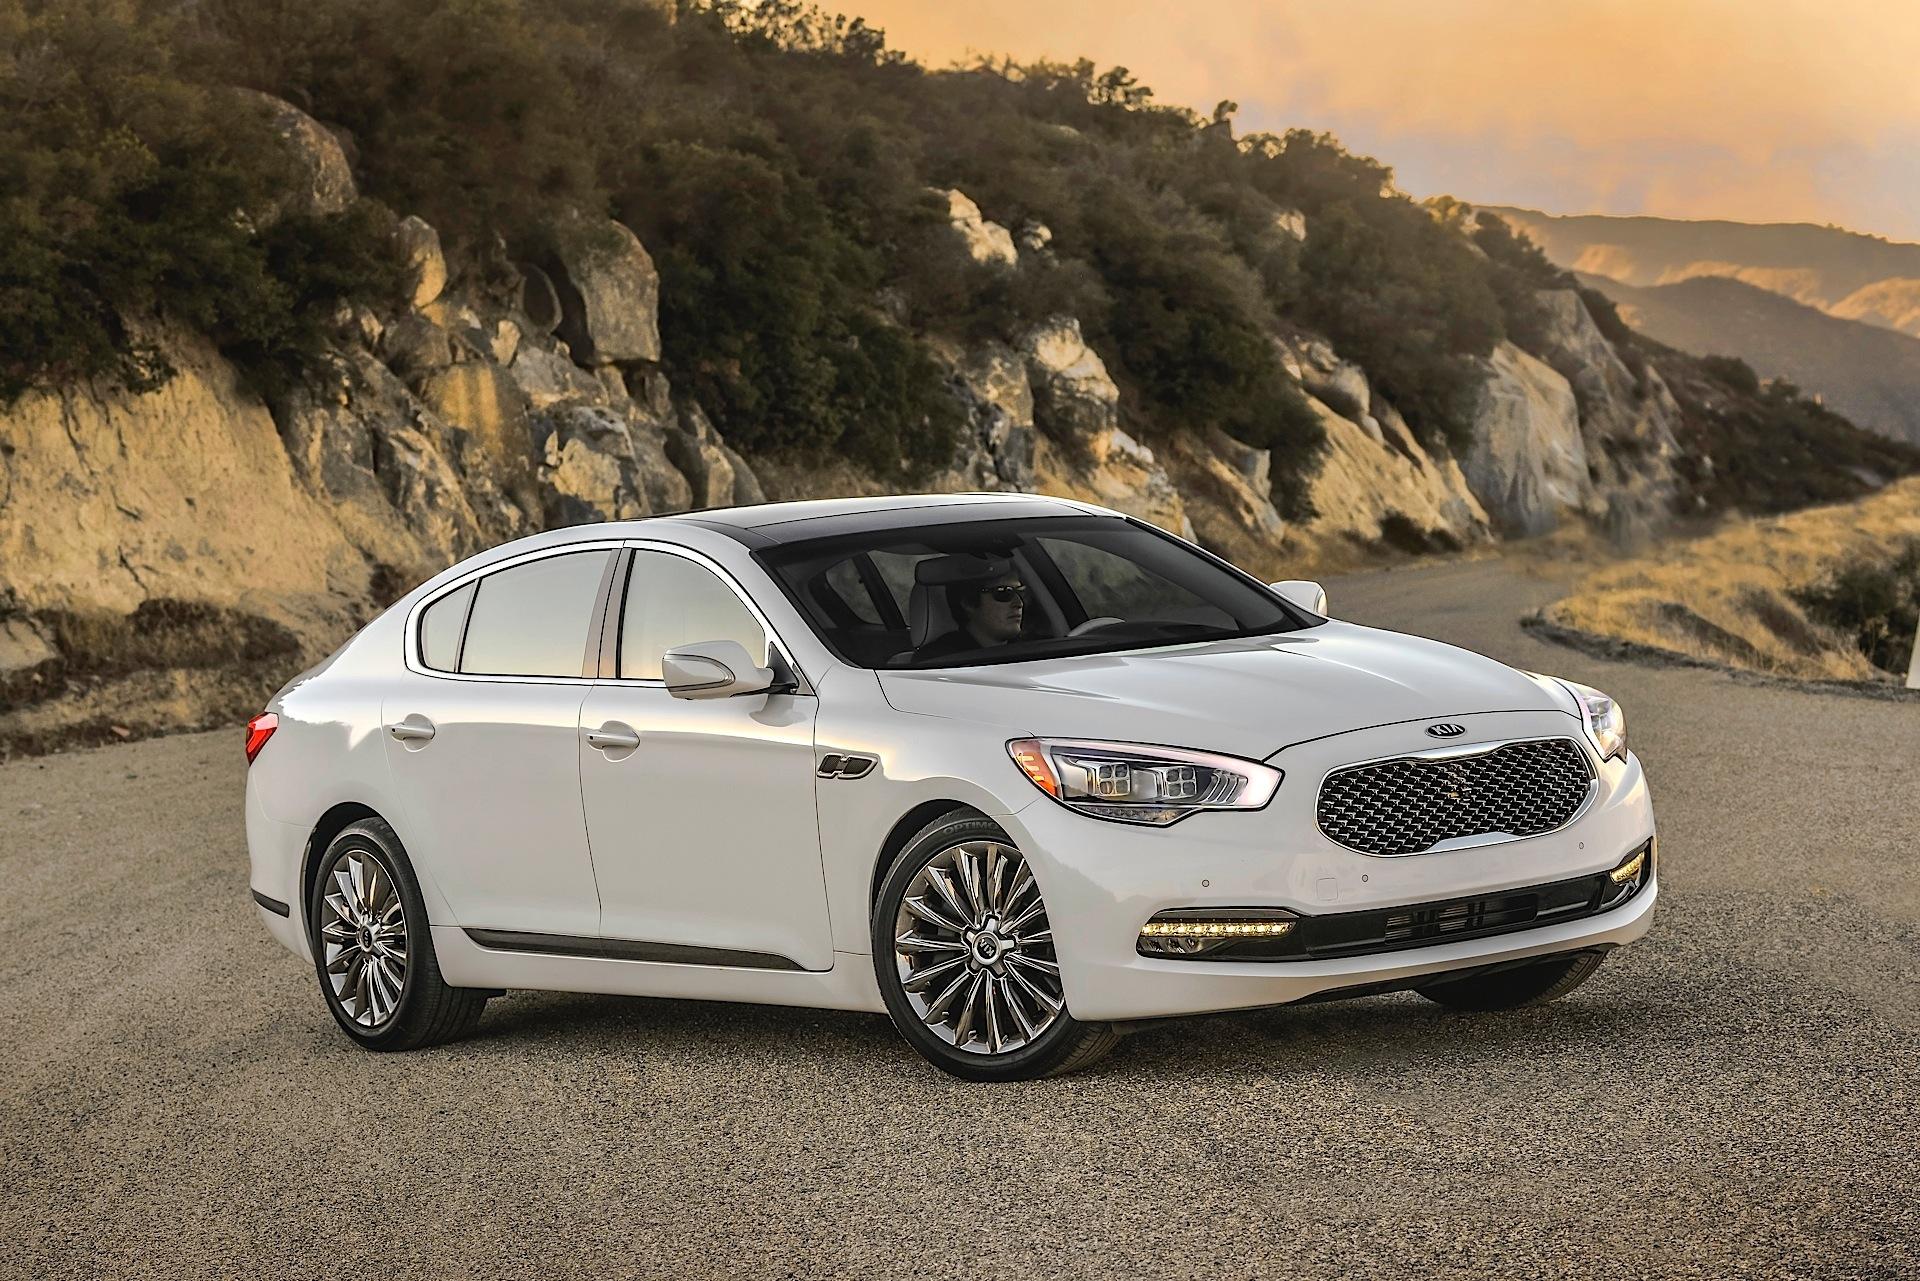 2013 Chrysler 300 For Sale >> KIA K9 / K900 - 2012, 2013, 2014, 2015, 2016, 2017 - autoevolution